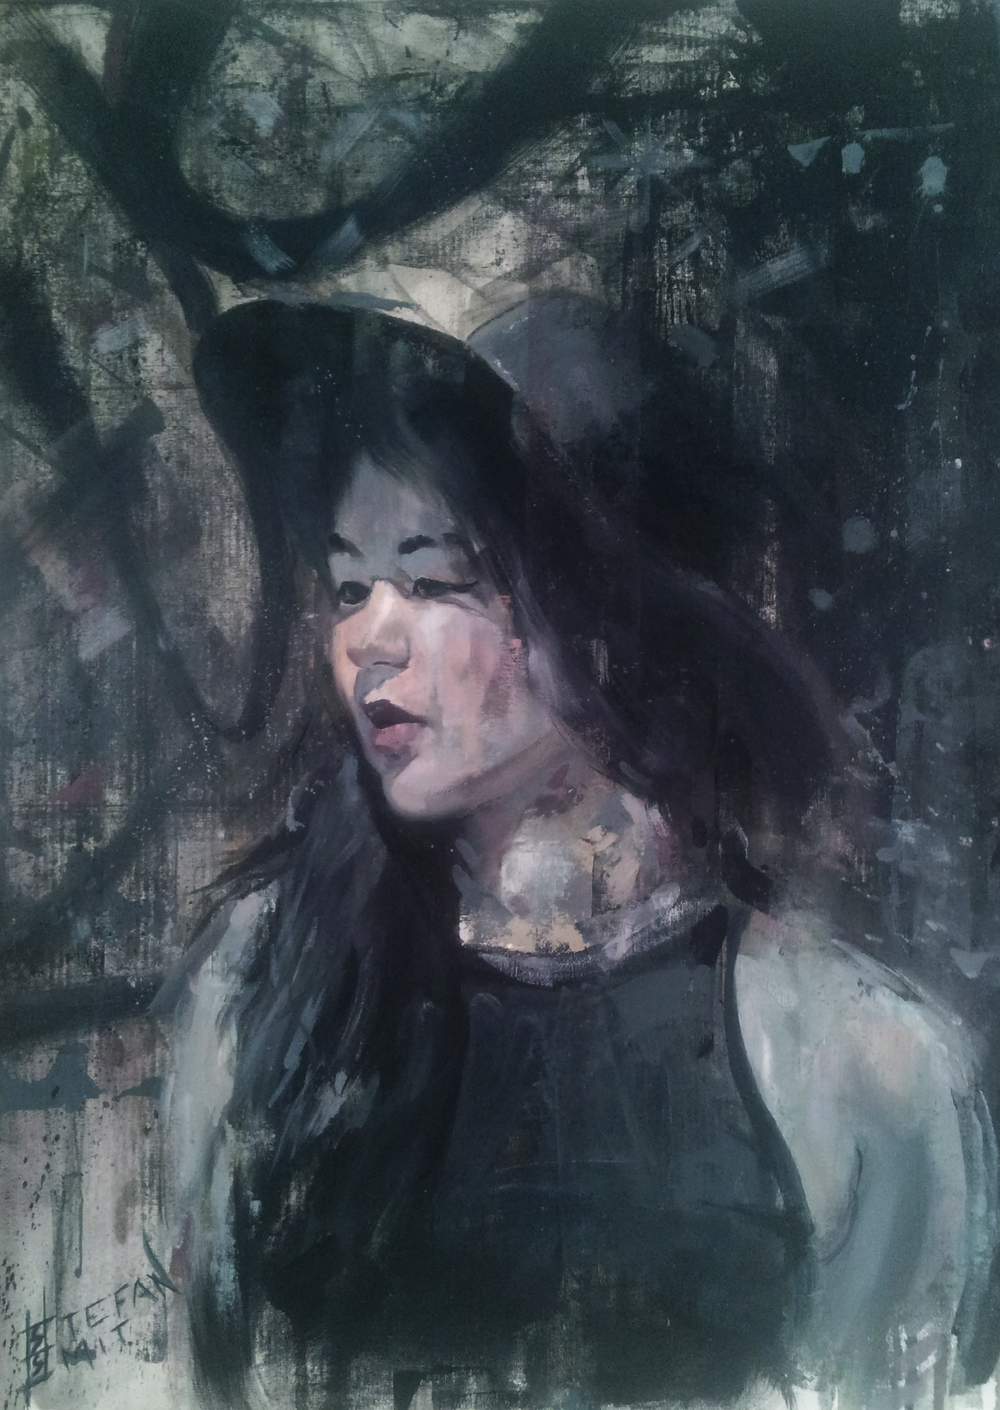 Stefan Smit  'Purpose'  Oil on canvas  71 x 56,5 cm